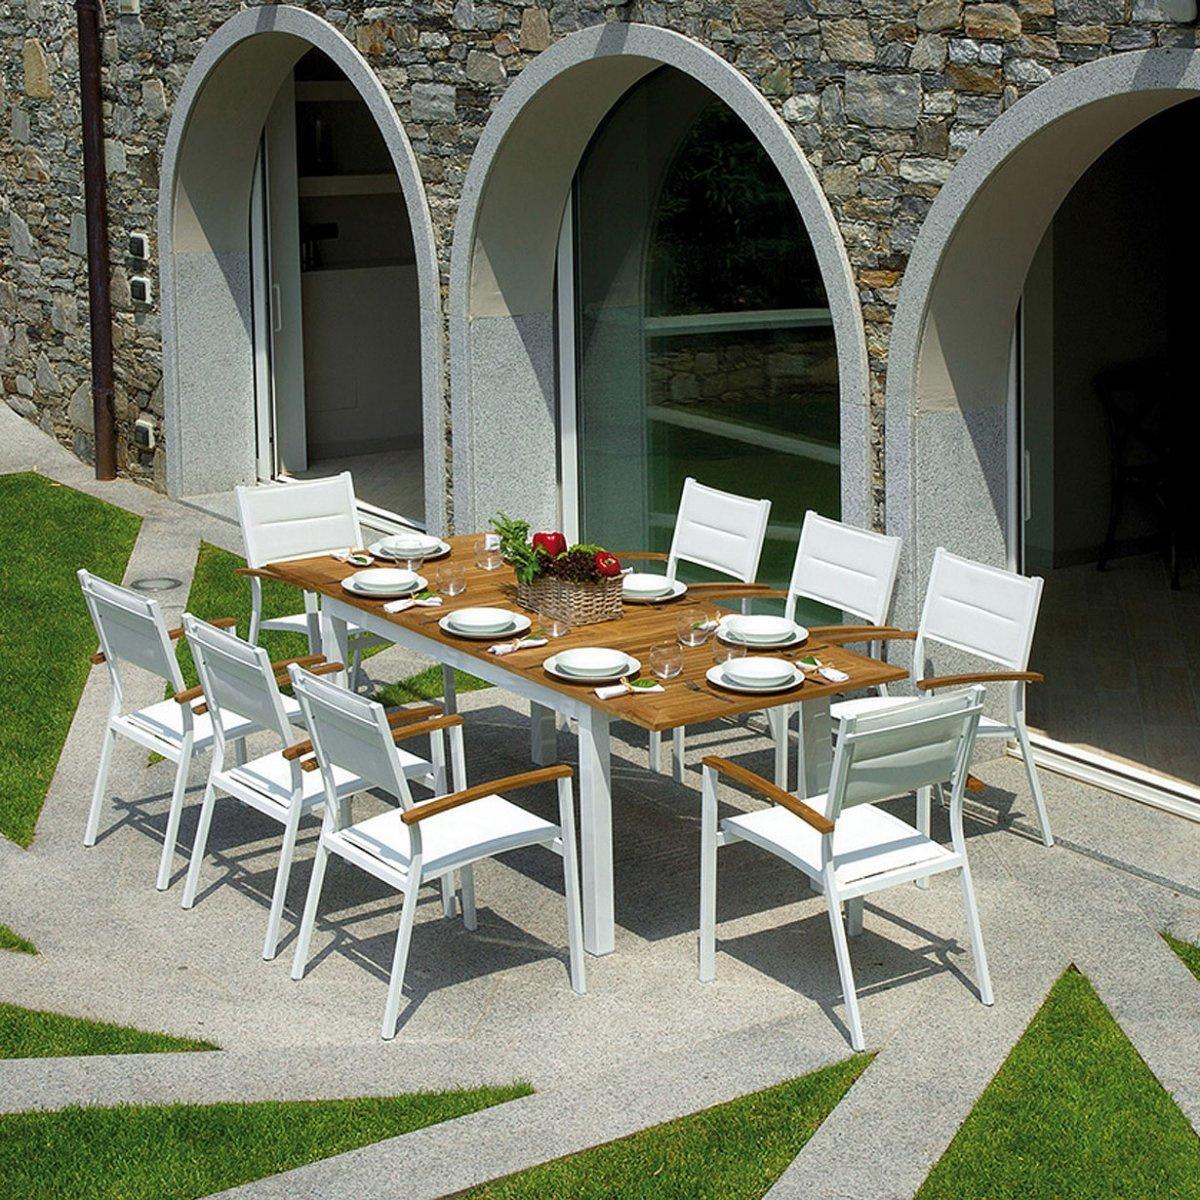 Greenwood Tavoli Da Giardino.Tavolo Da Giardino Ajaccio By Outdoor Selection Lovethesign